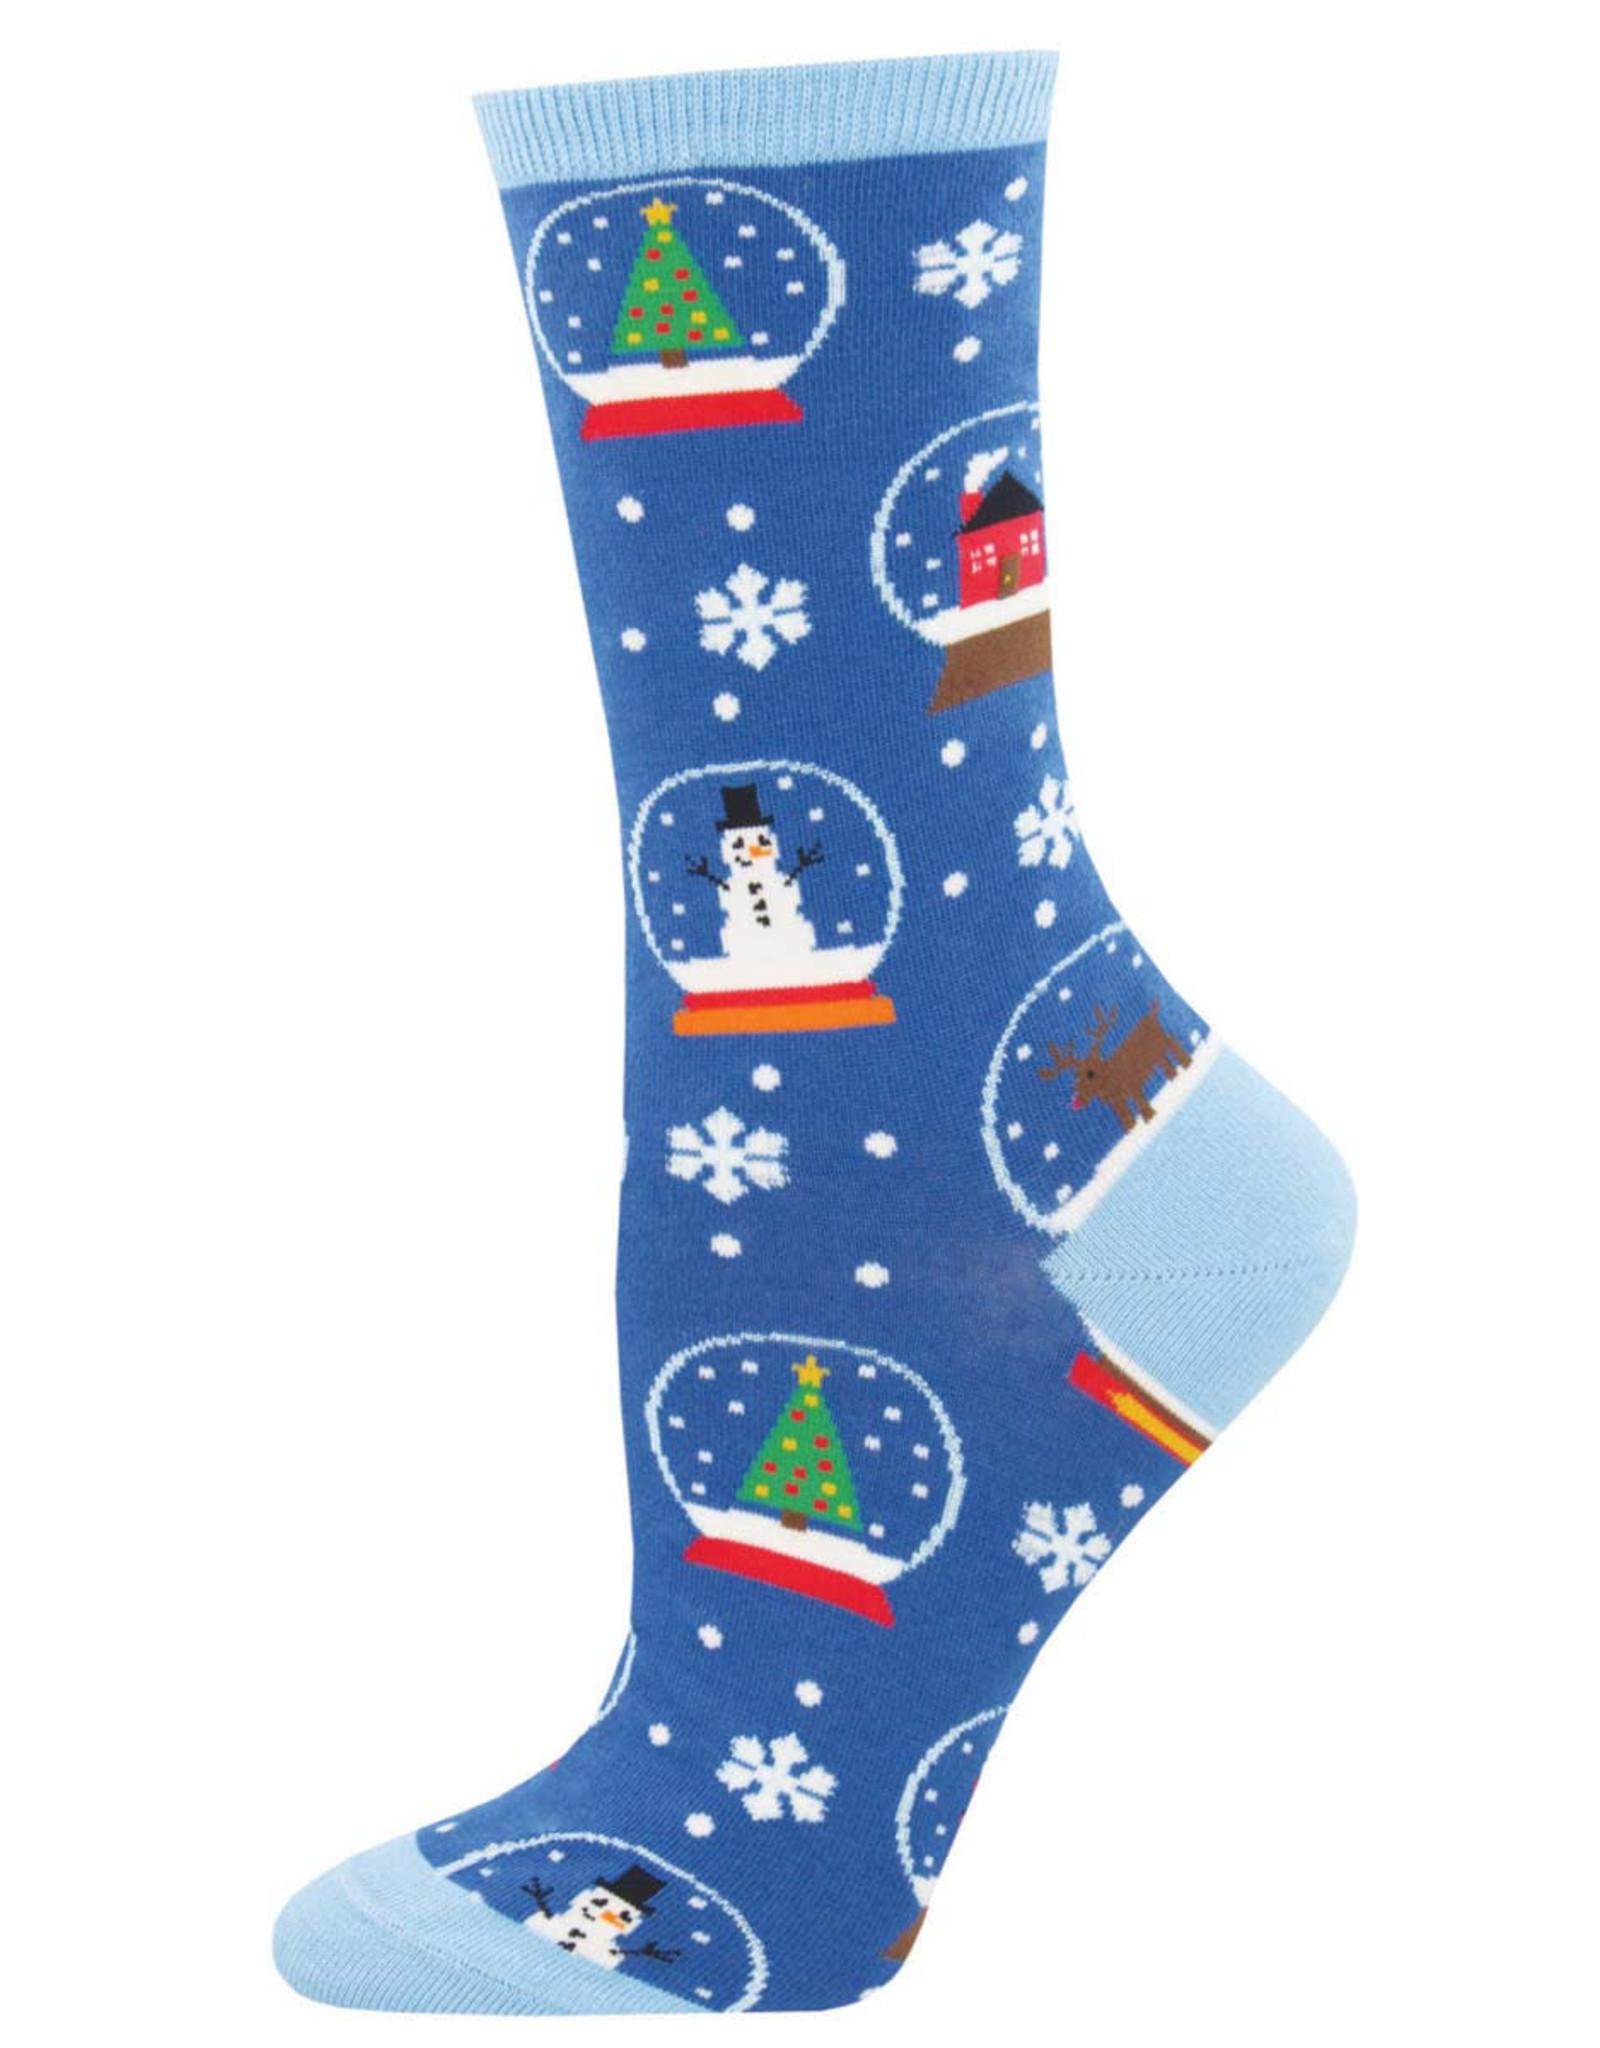 Socksmith Women's Snow Much Fun Blue Socks